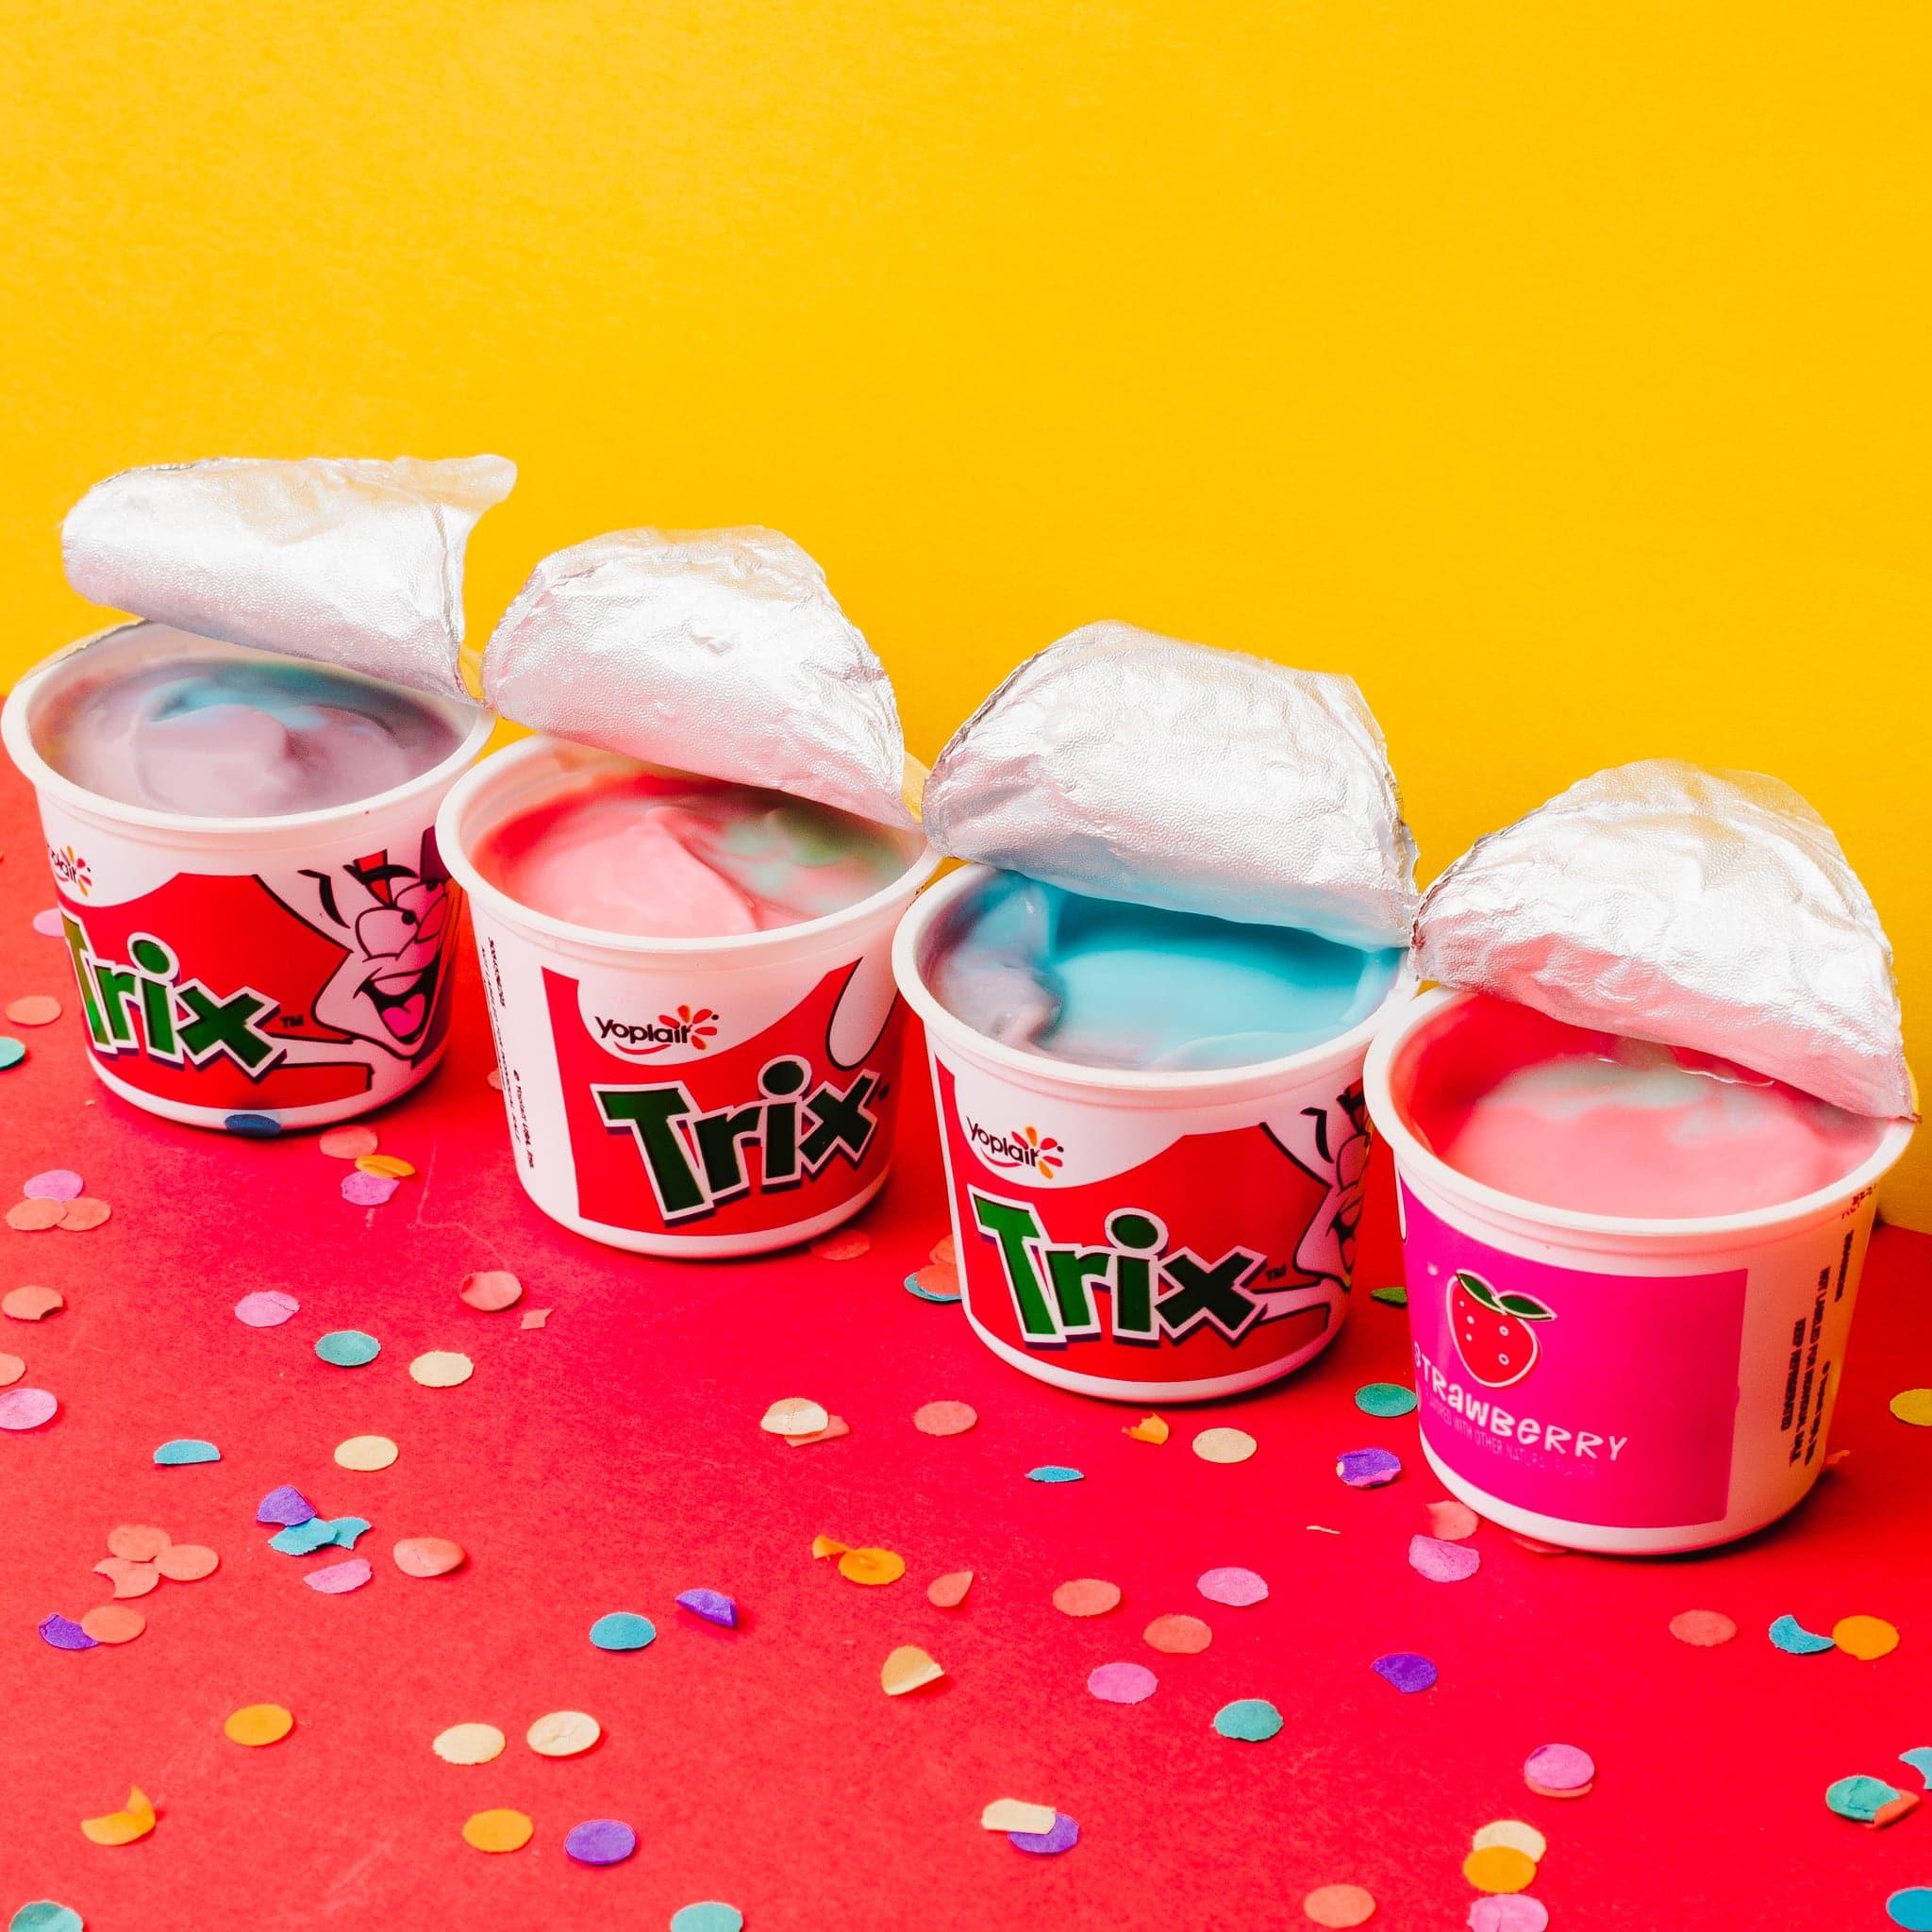 Trix Yogurt is coming back after a five-year hiatus 16